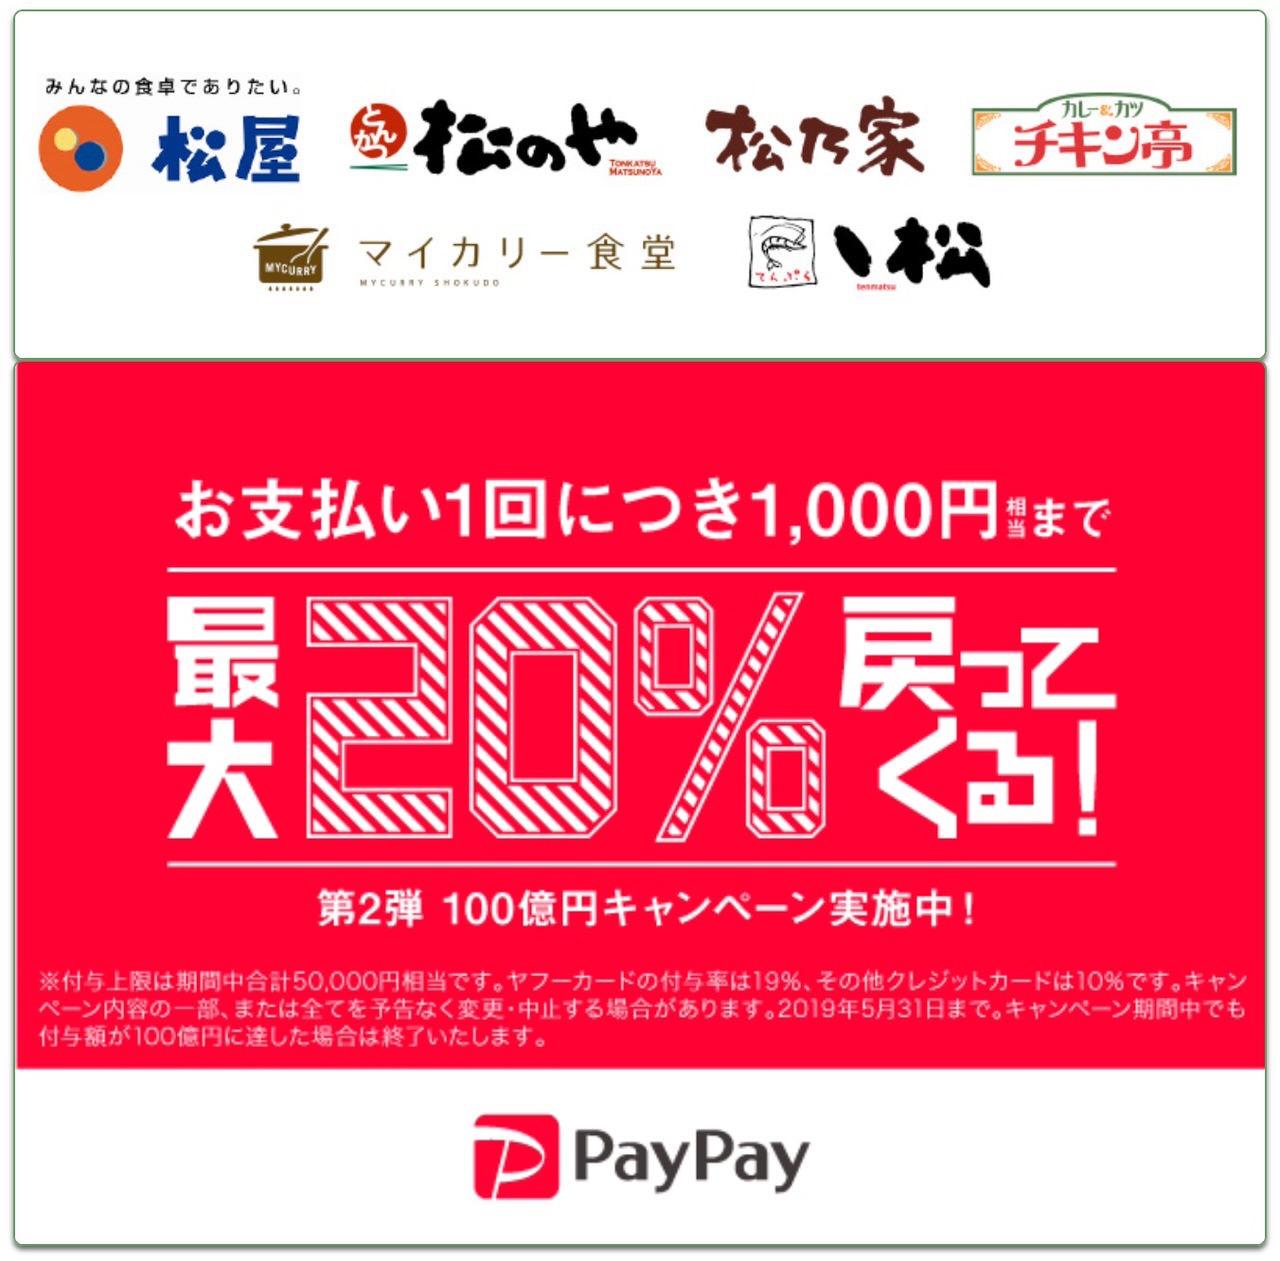 【PayPay】「松屋」 「松乃家・松のや・チキン亭」「マイカリー食堂」「ヽ松(てんまつ)」全1,130店舗で導入開始(2/19〜)